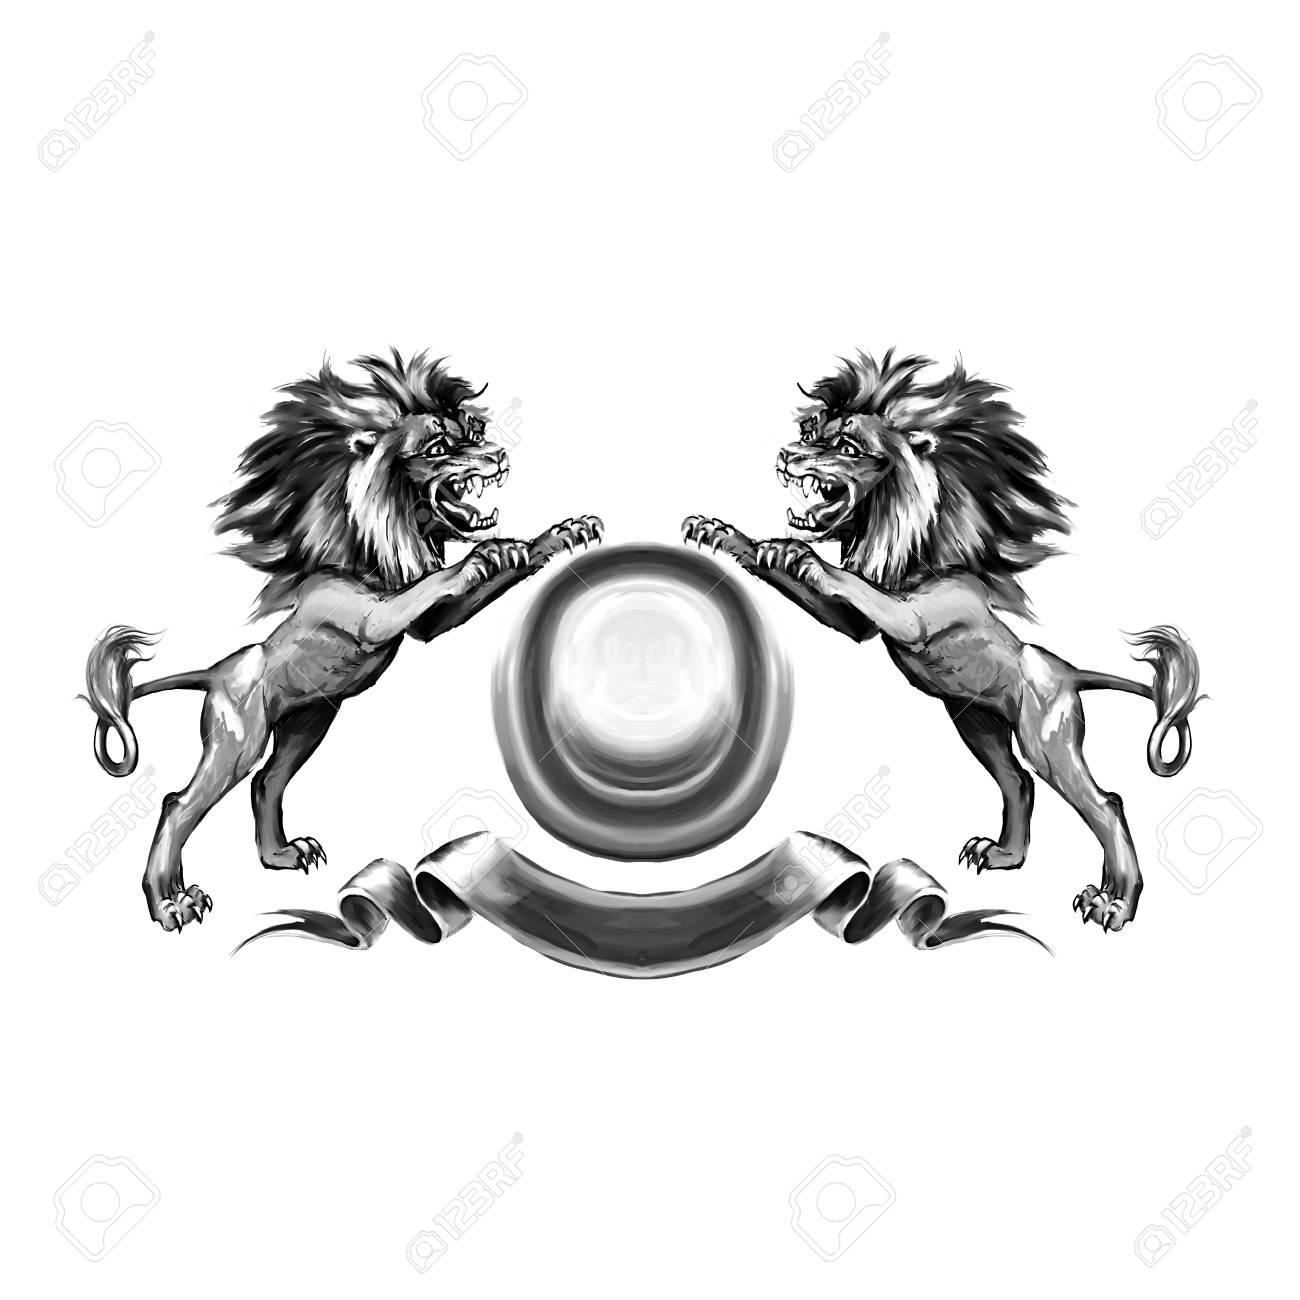 Lions, coat of arms, attacking, heraldic symbol